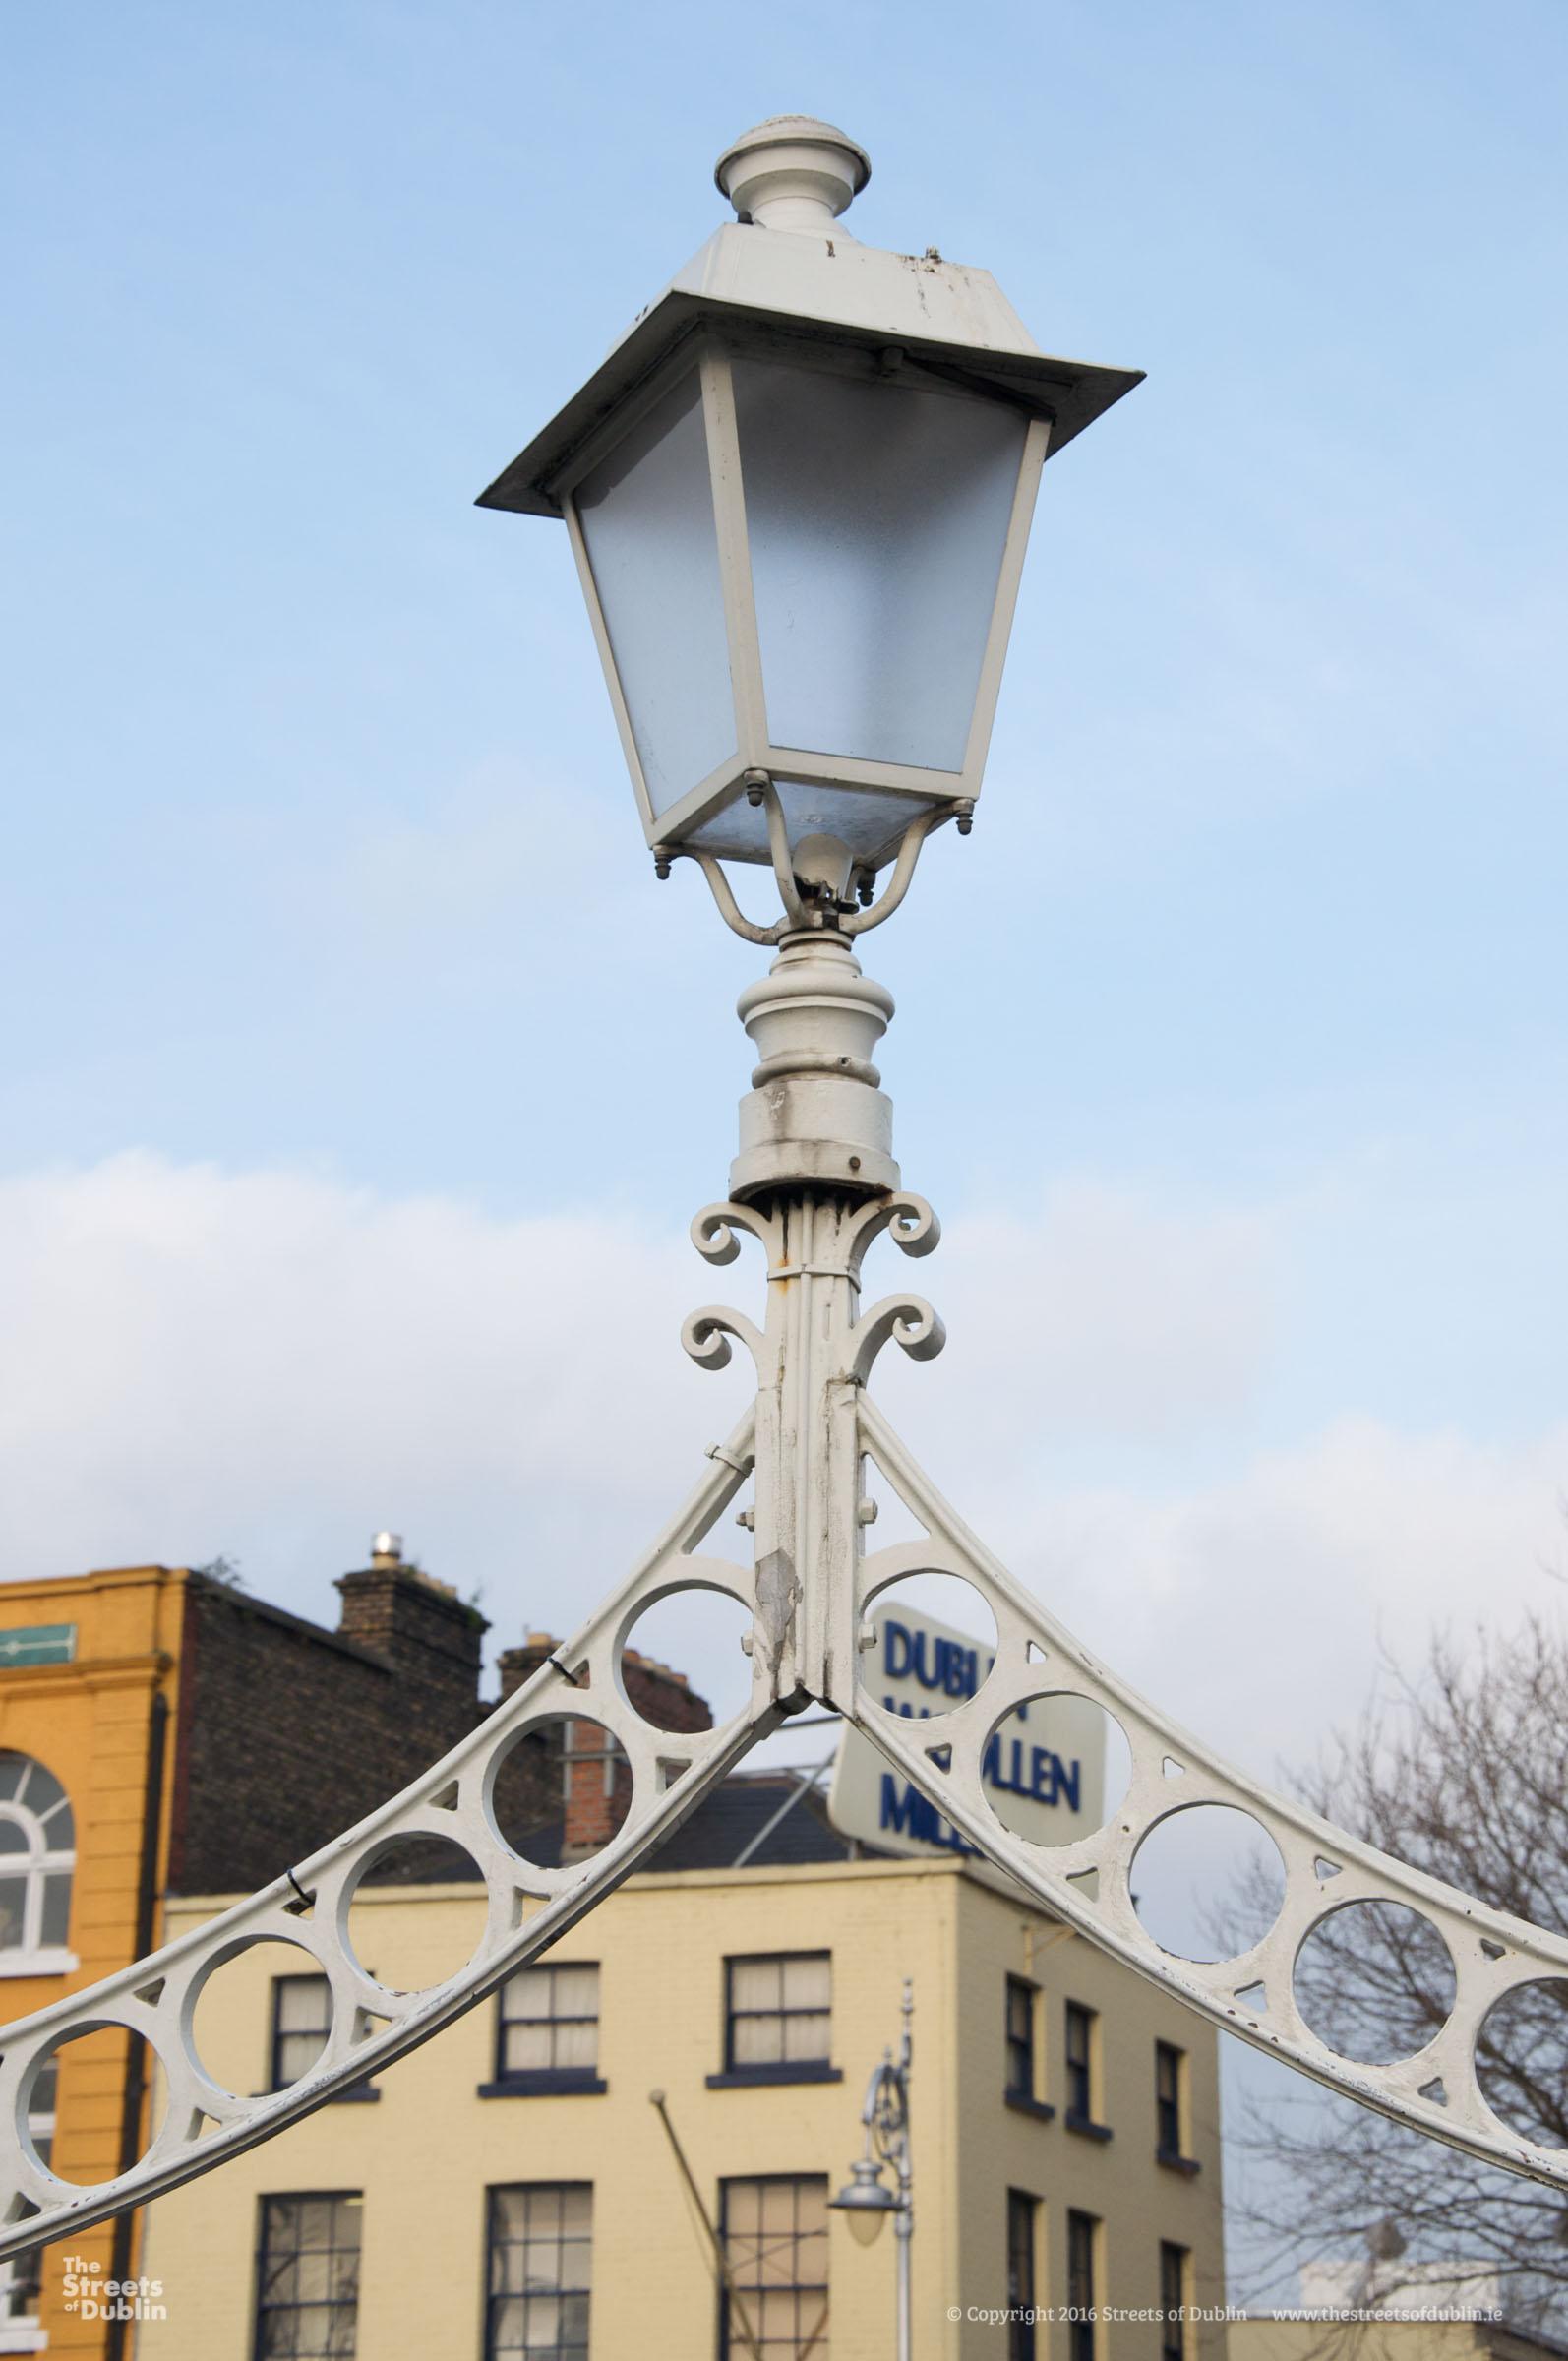 Streets-of-Dublin-Photo-48-2.jpg